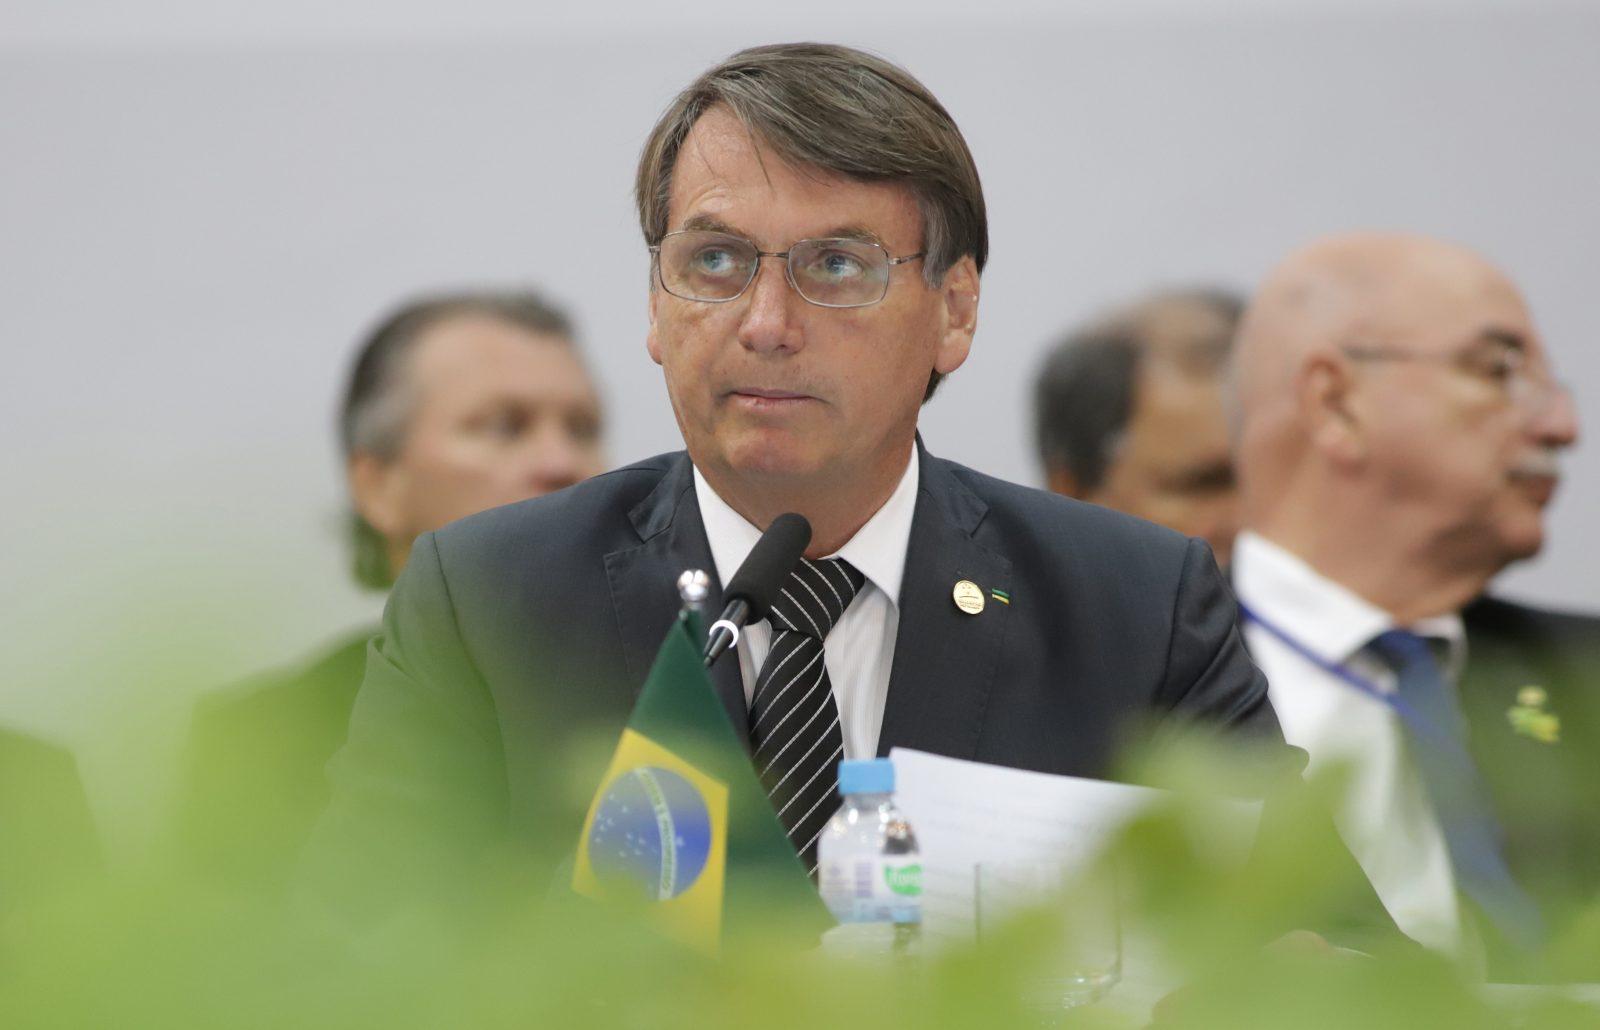 Brasiliens Präsident Jair Bolsonaro Foto: picture alliance / Photoshot